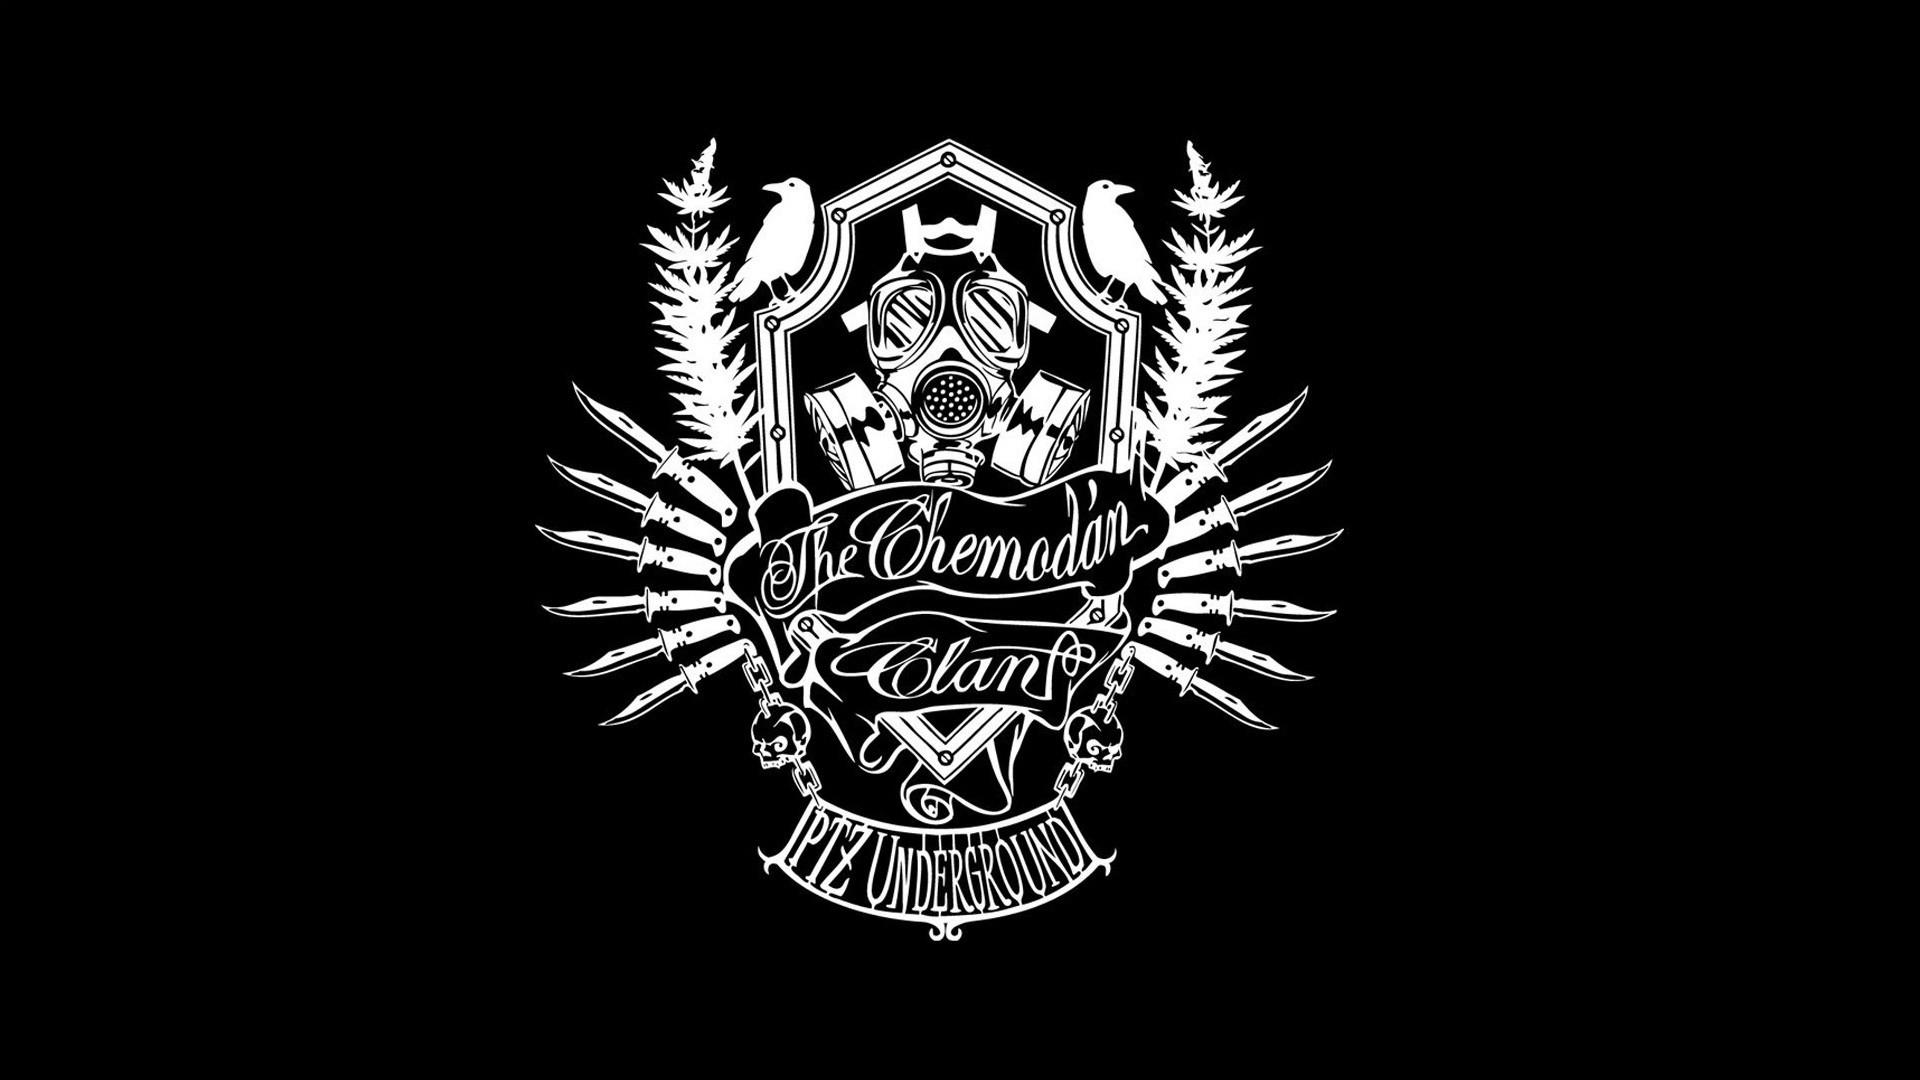 Sucios Logo Wallpaper Minimlizm minimalismo